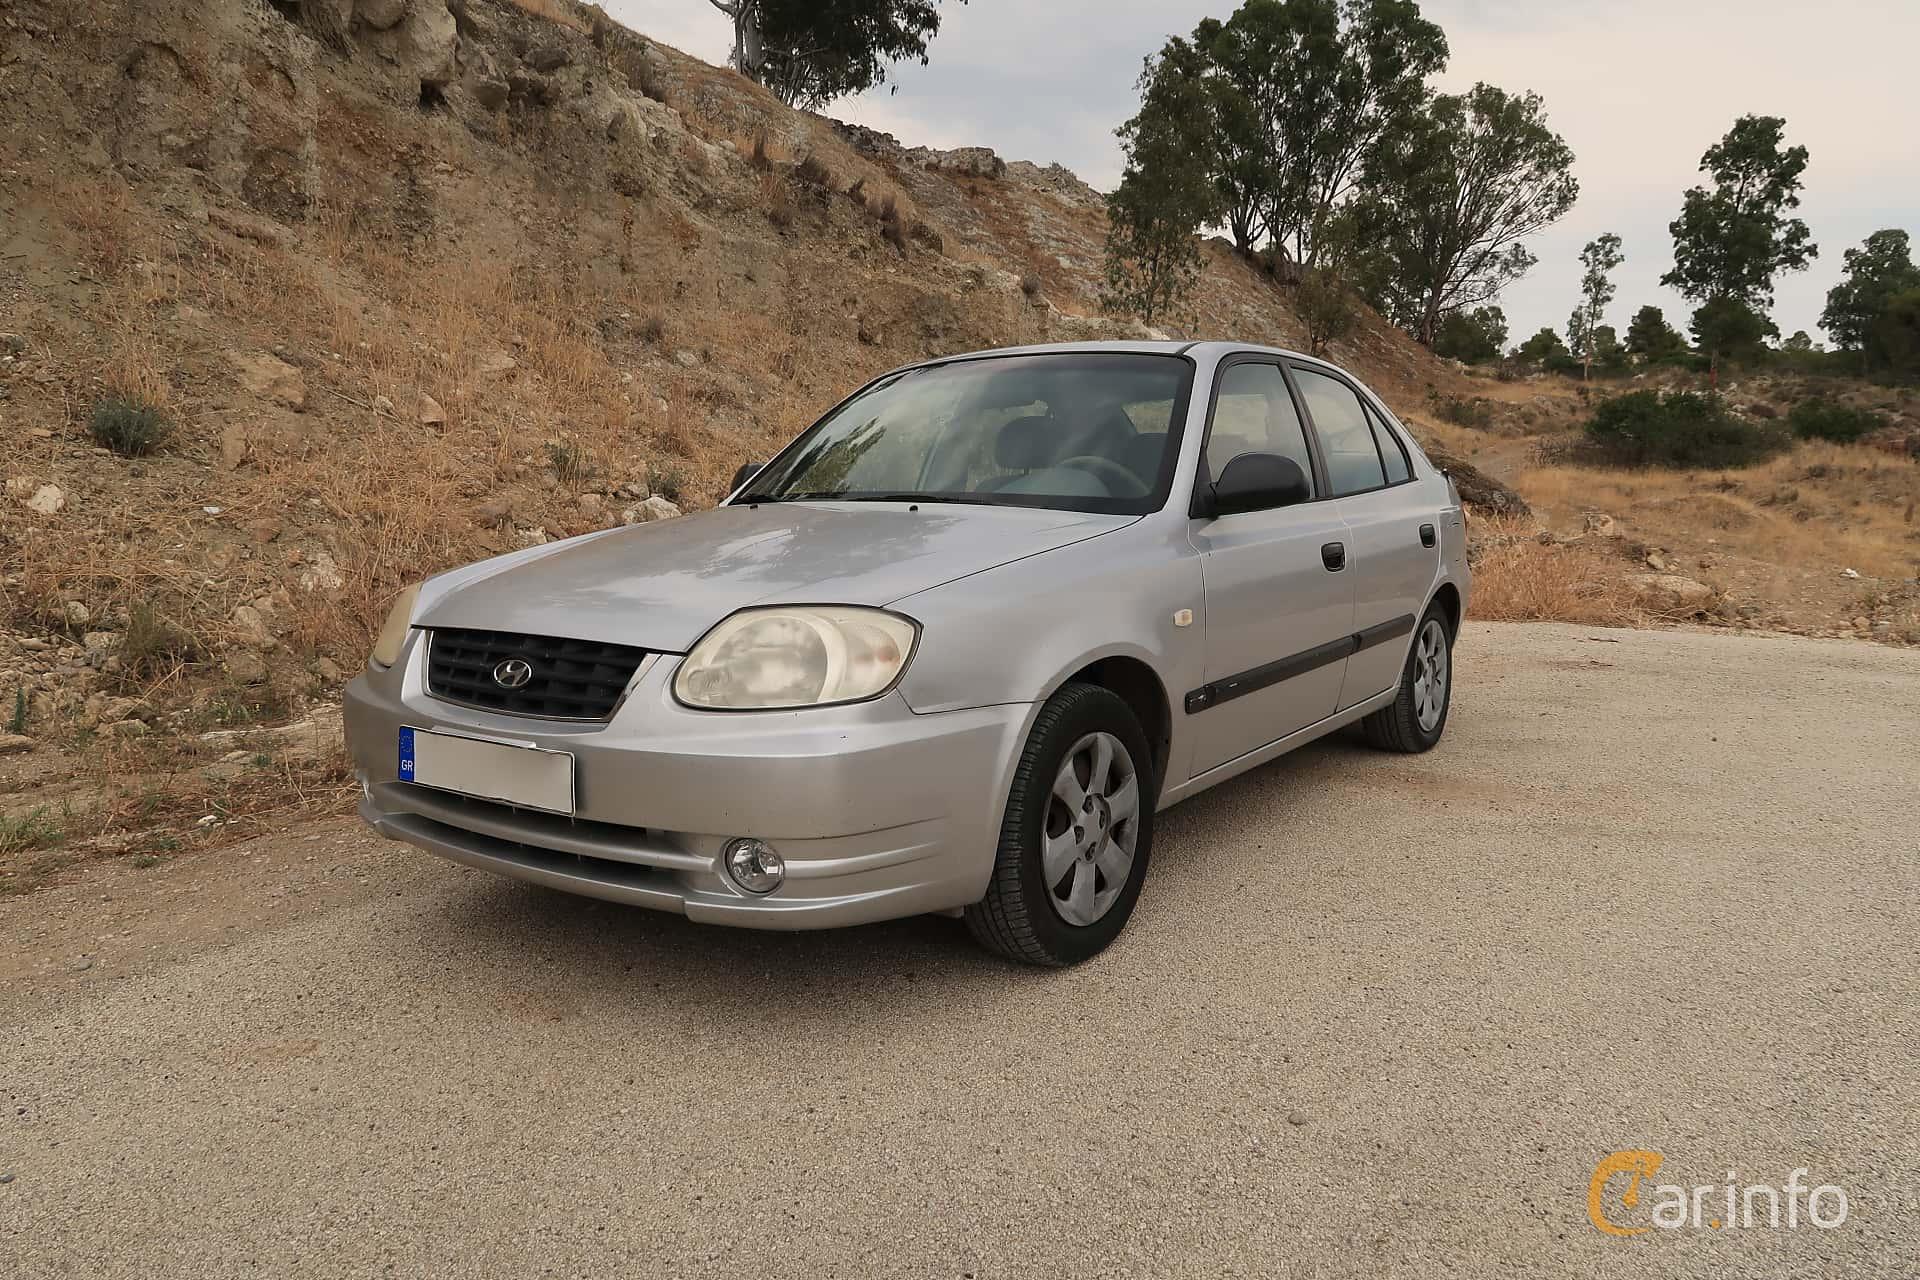 Hyundai Accent 5-door 1.3 Manual, 86hp, 2005